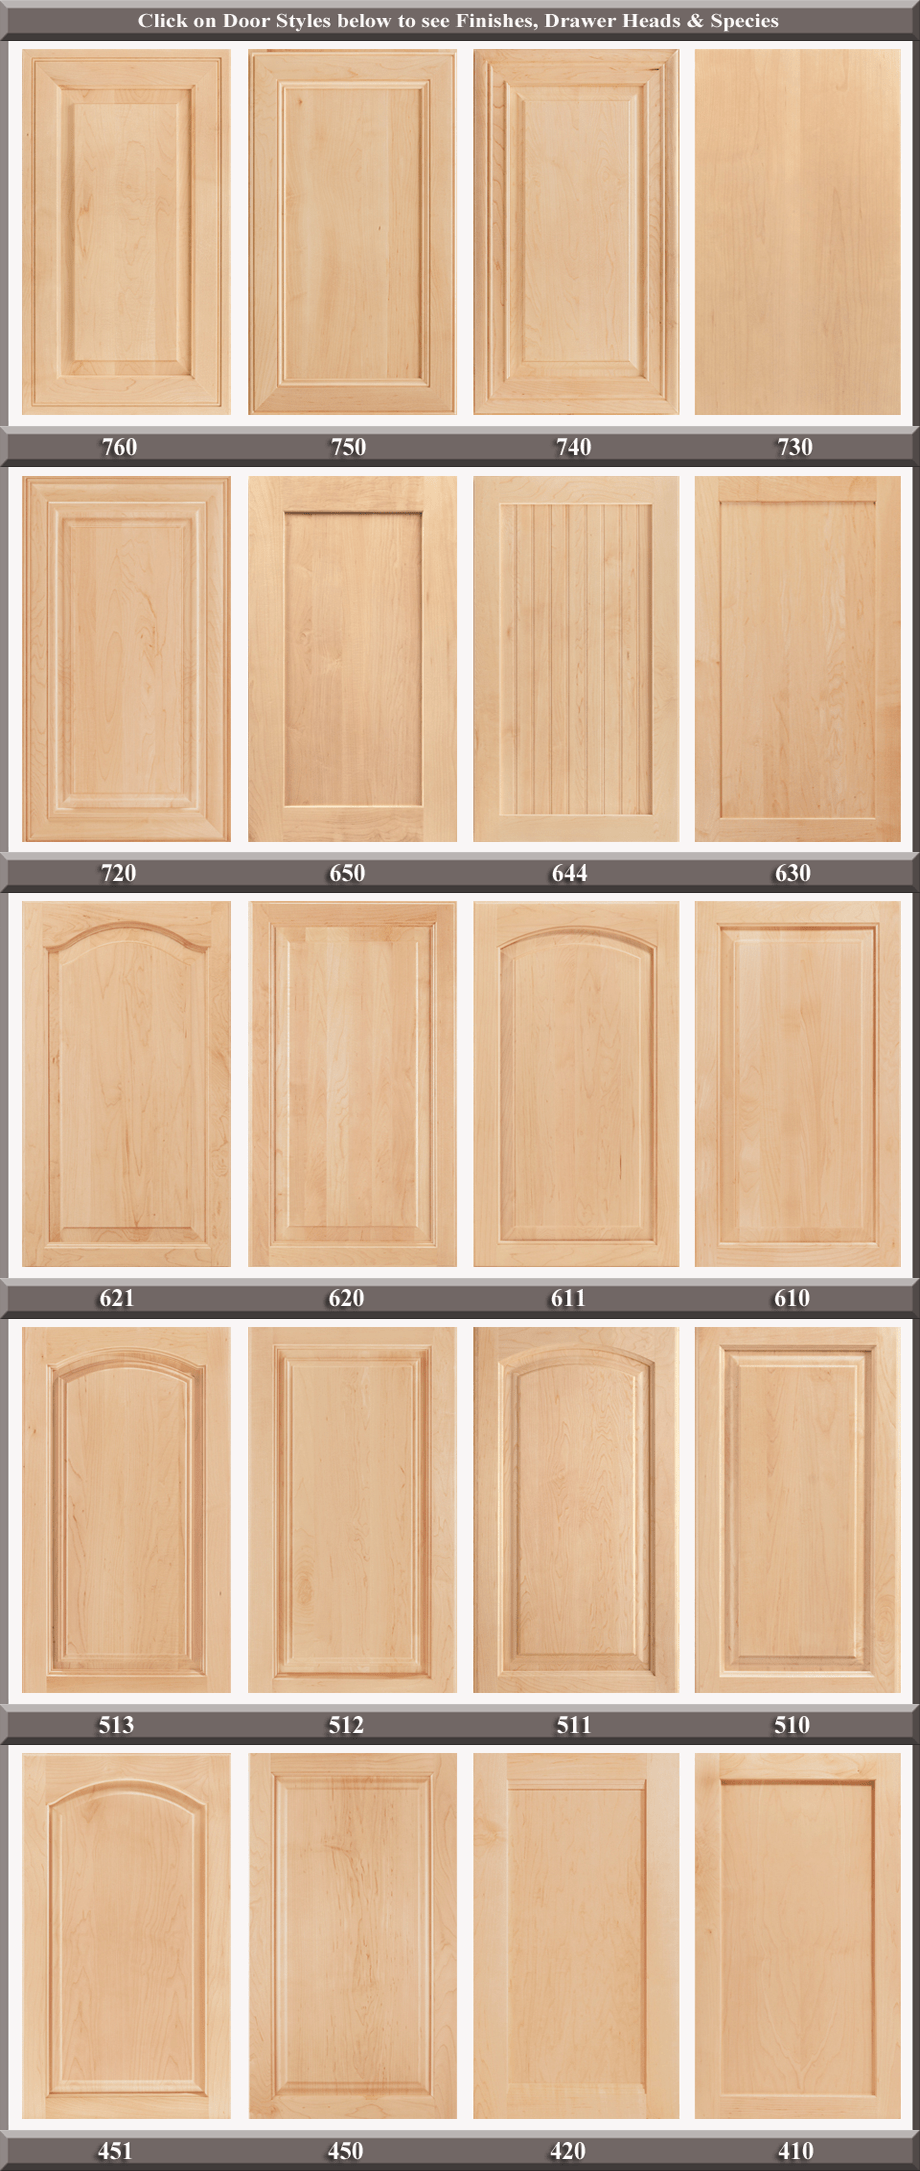 popular cabinet door styles finishes kitchen cabinet door styles Popular Cabinet Door Styles Finishes